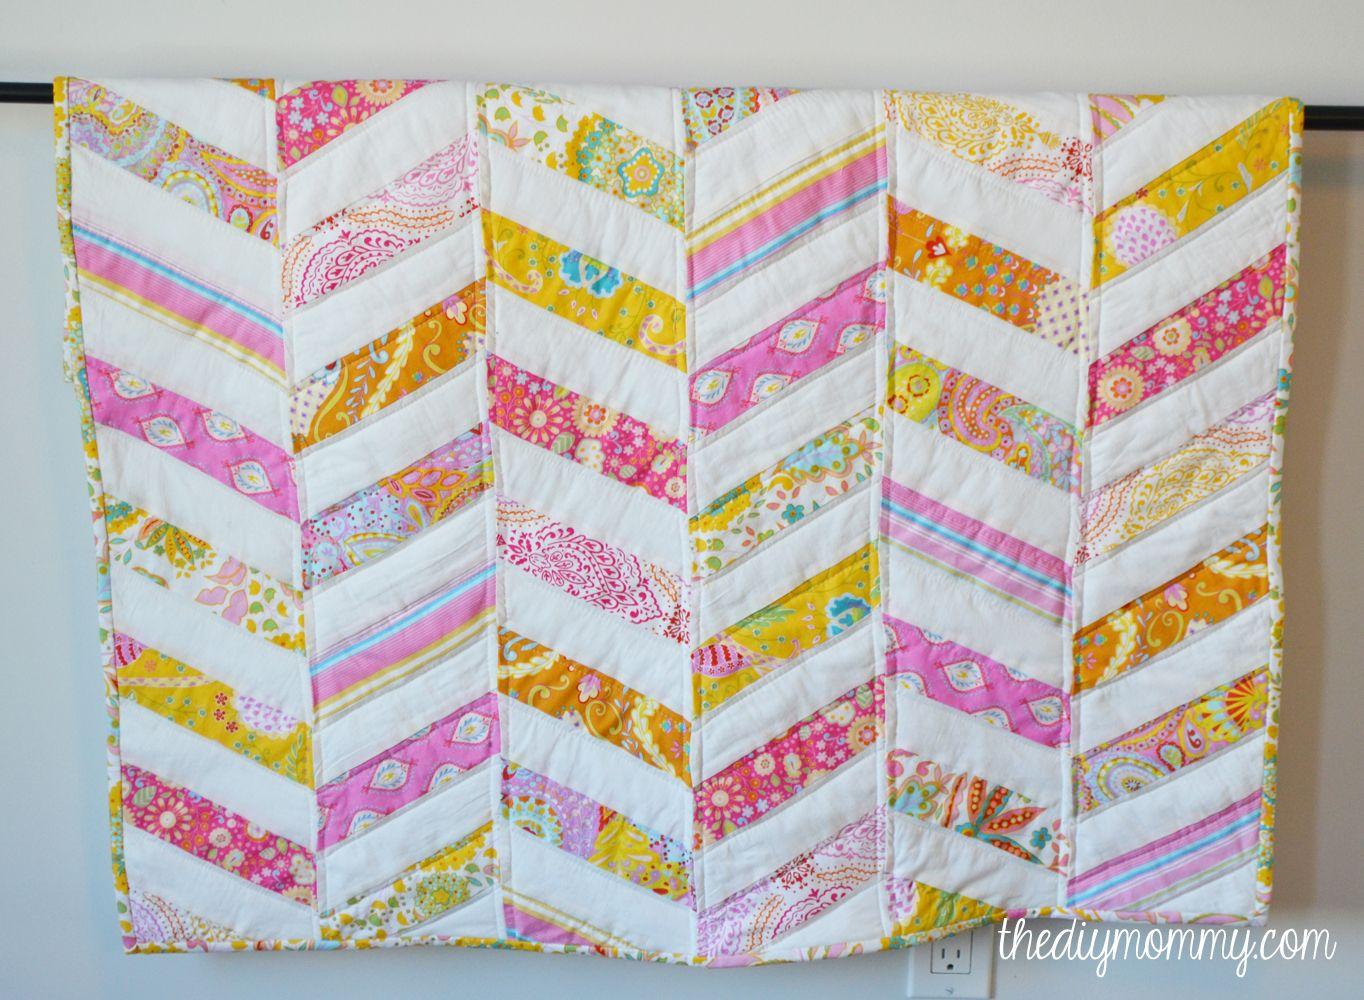 DIY Herringbone / Chevron Baby Quilt Tutorial - The DIY Mommy ... : pattern for chevron baby quilt - Adamdwight.com